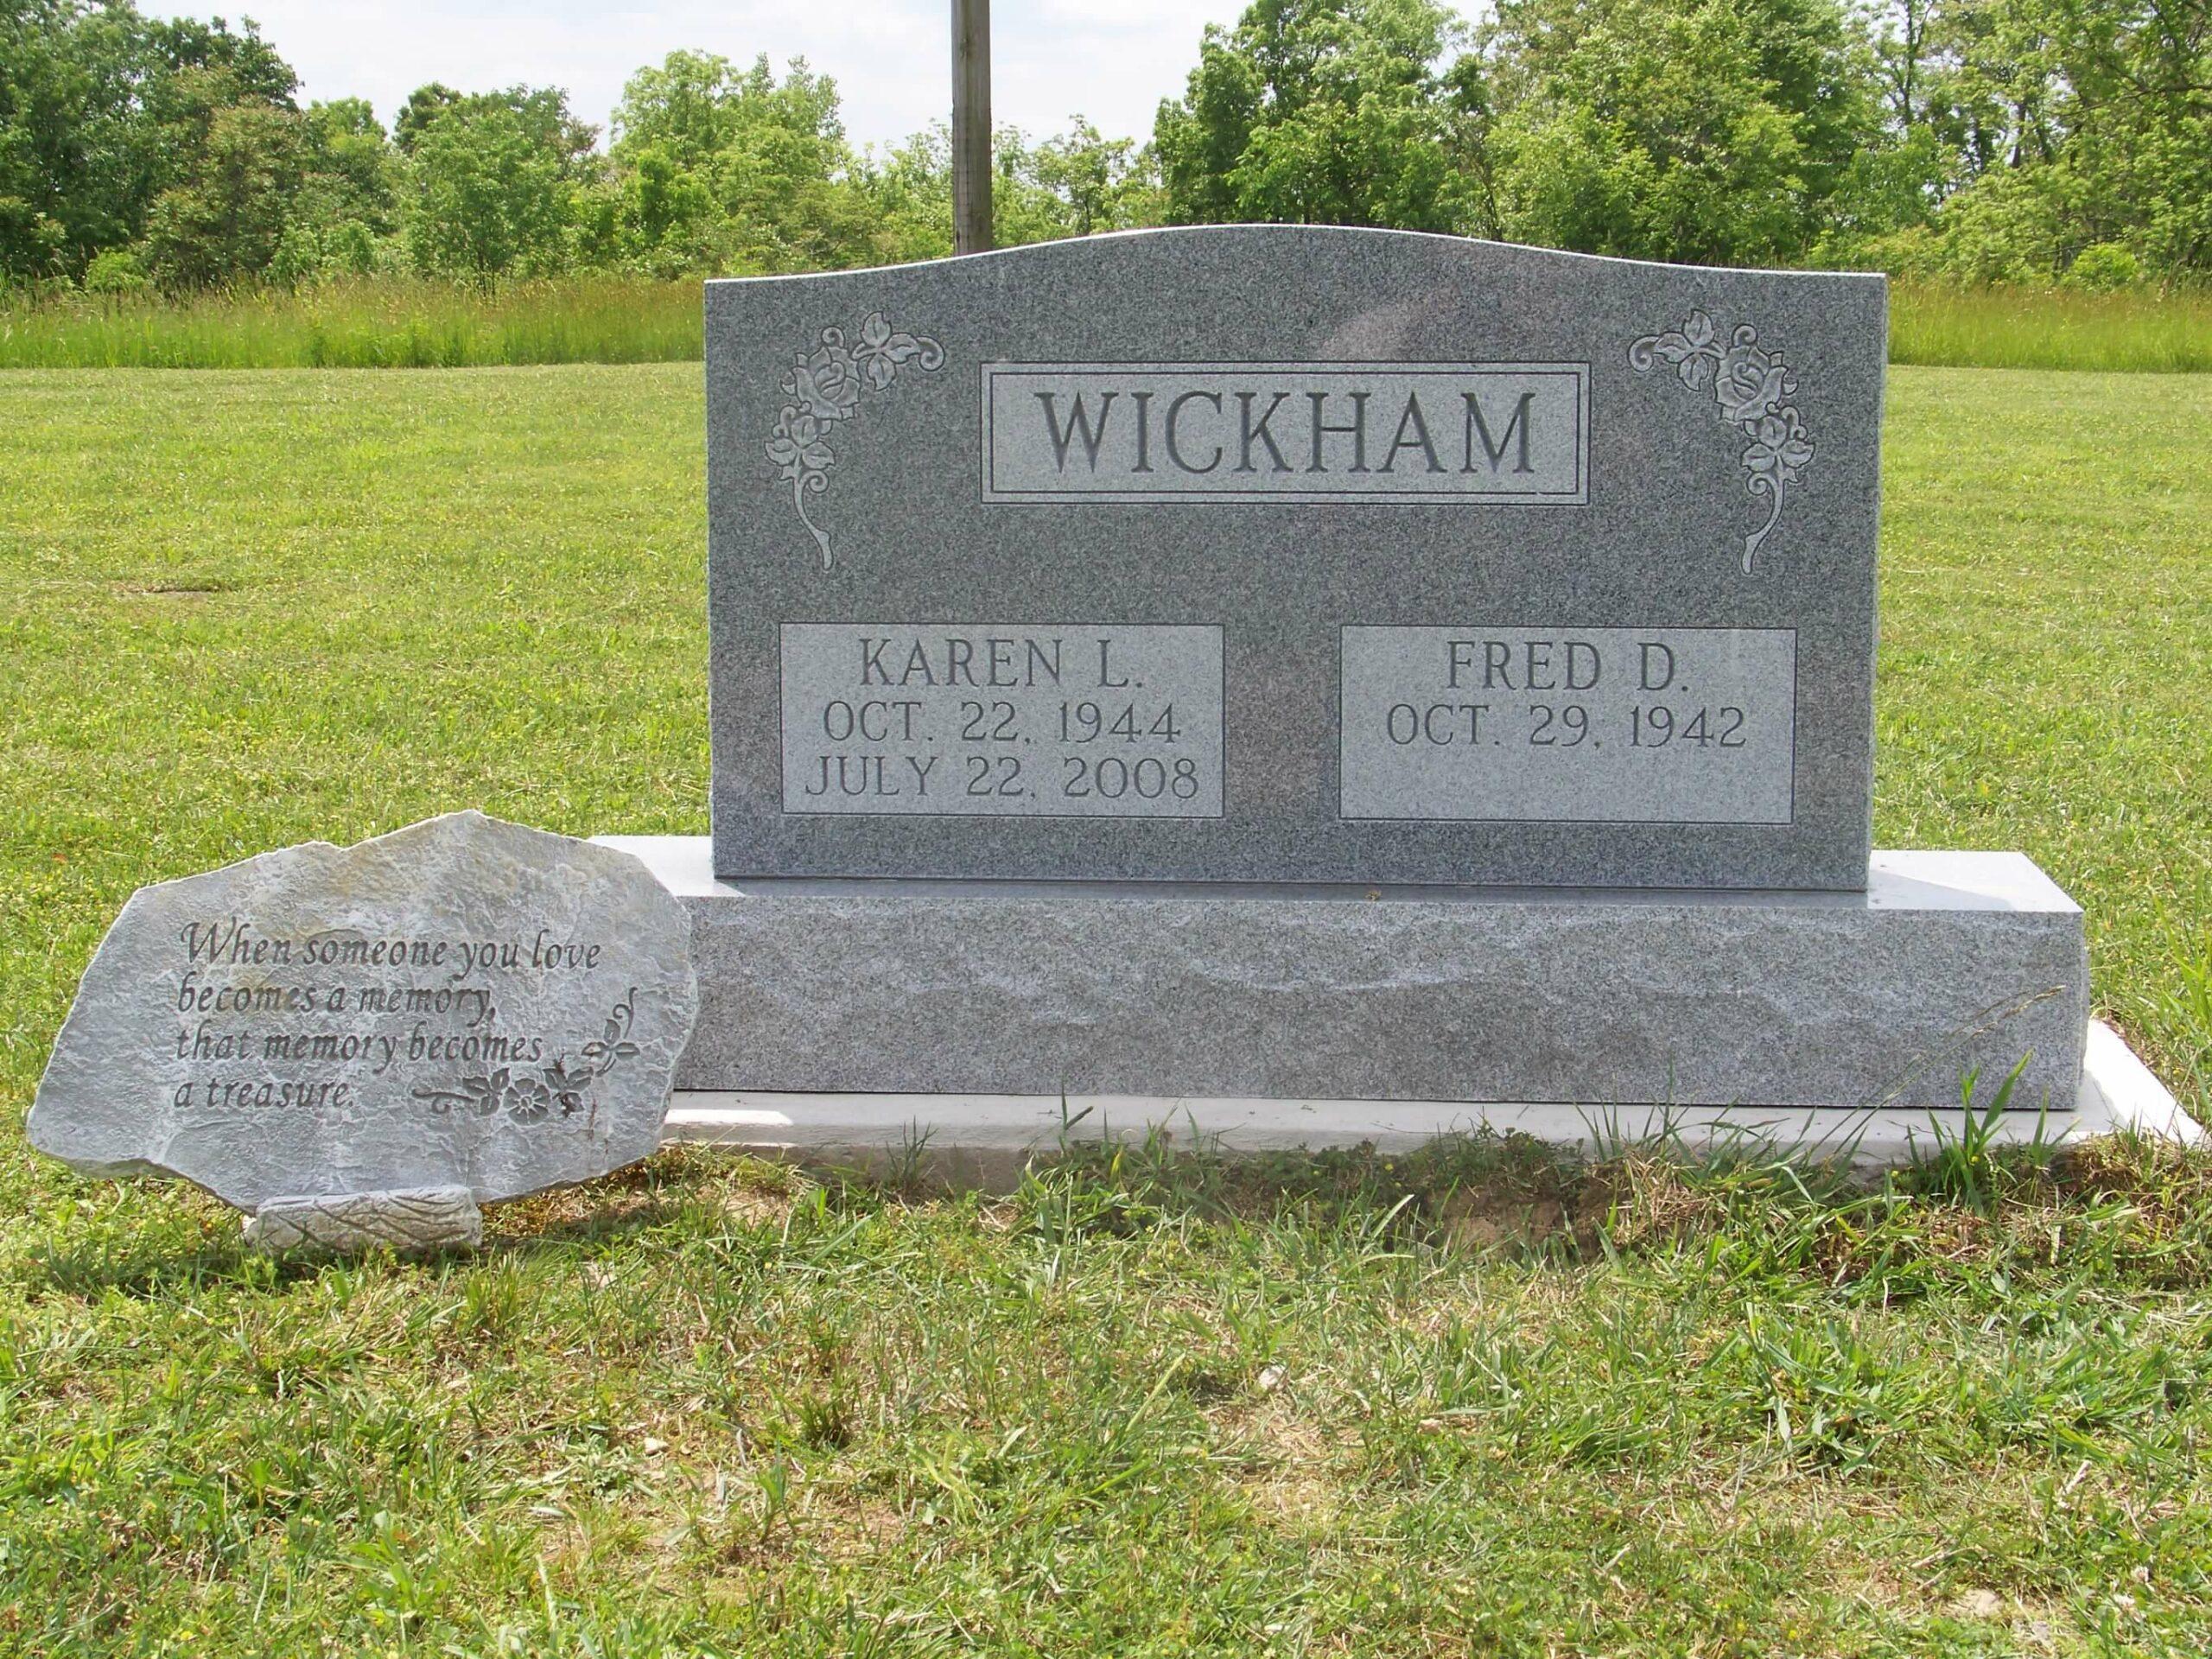 Wickham, Karen I.